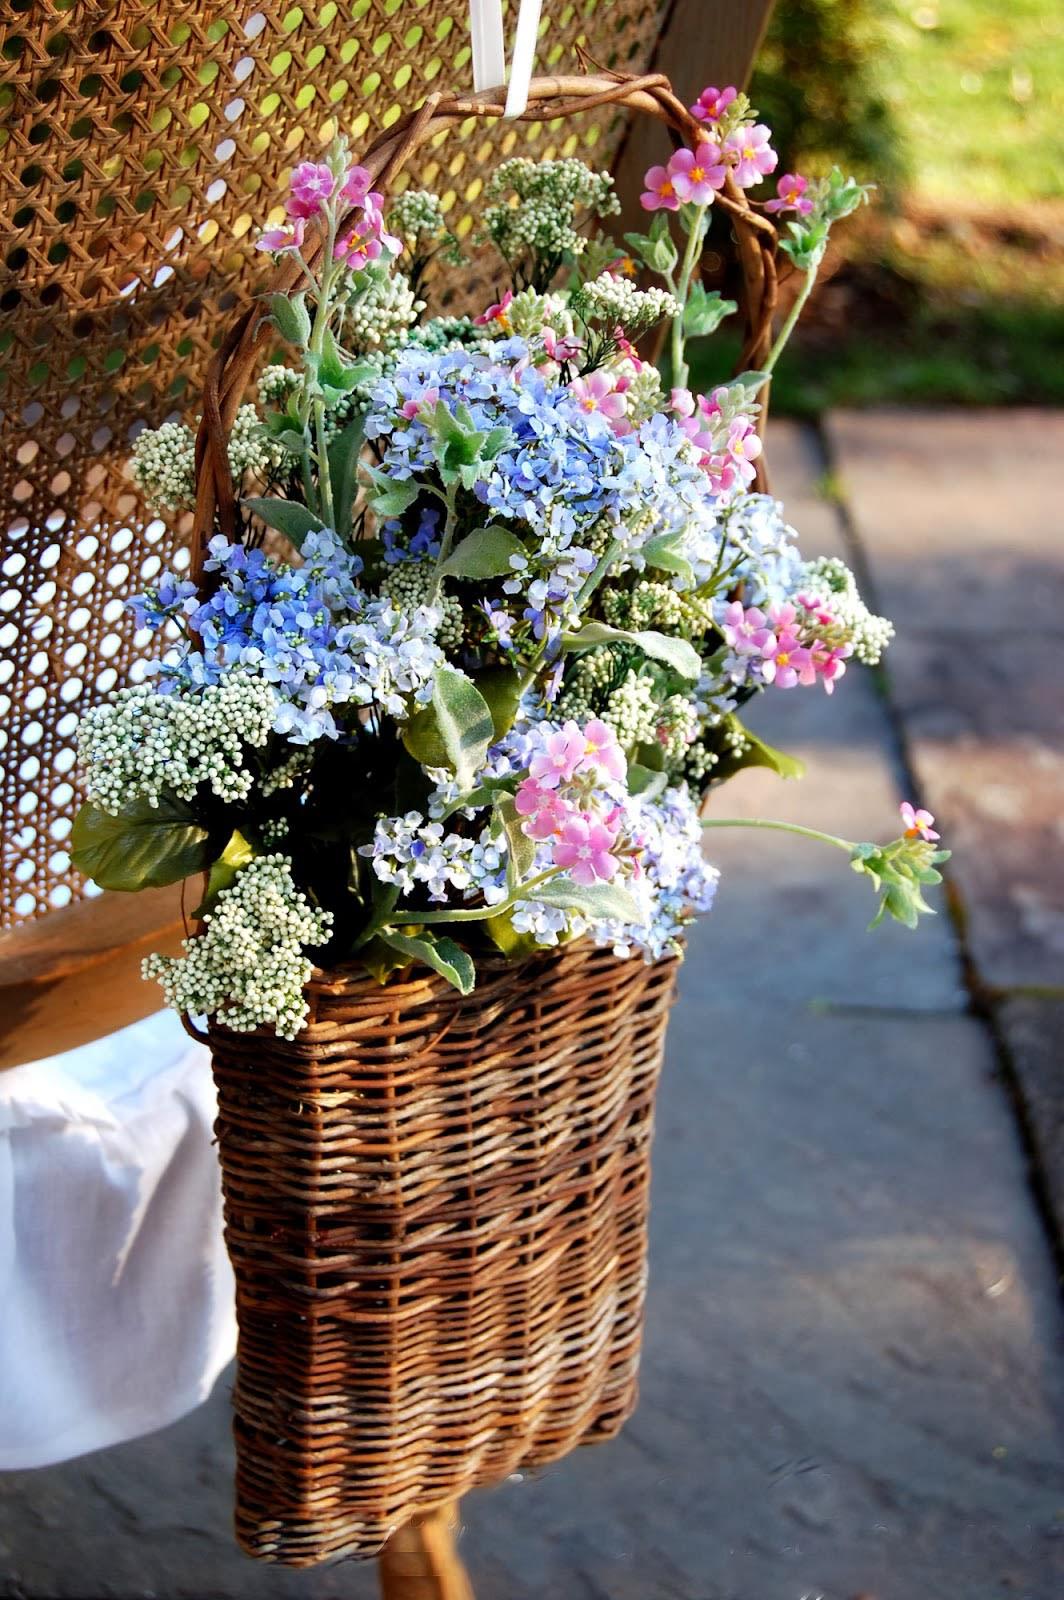 Varun Dhawan Hd Wallpaper Flowers Baskets Hd Wallpapers Free Download Unique